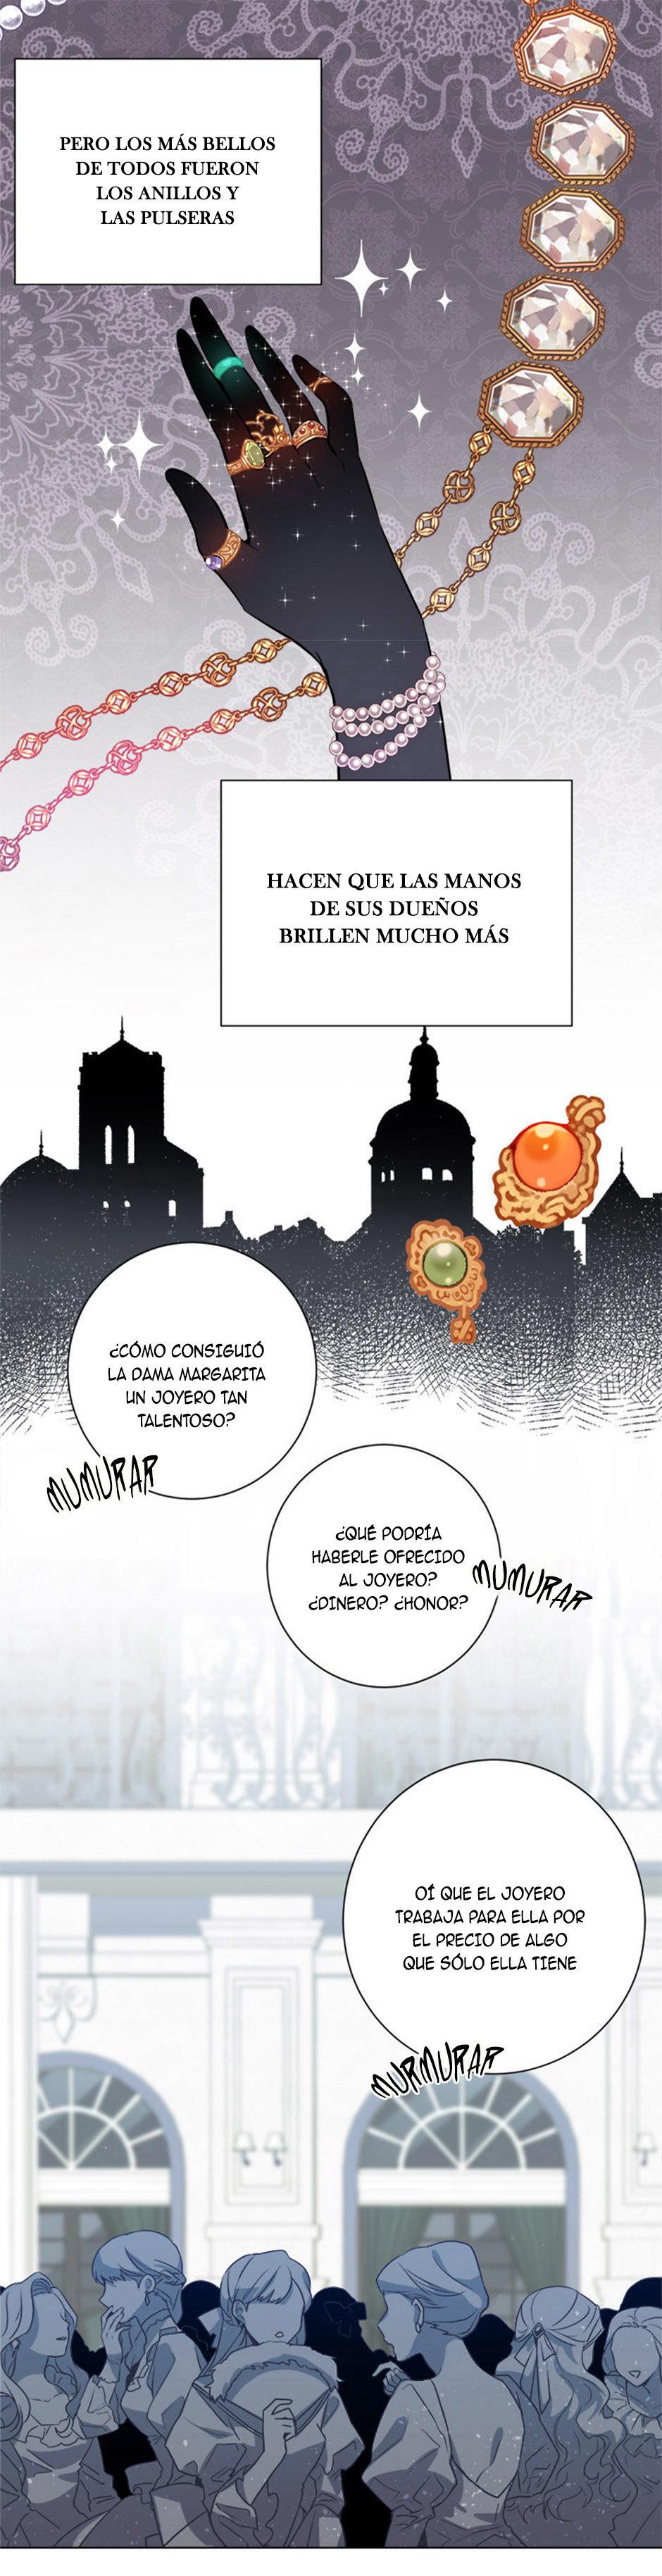 https://nine.mangadogs.com/es_manga/pic8/61/36669/946551/ba939af3dcadd92542ed5d4a0ade4dca.jpg Page 7